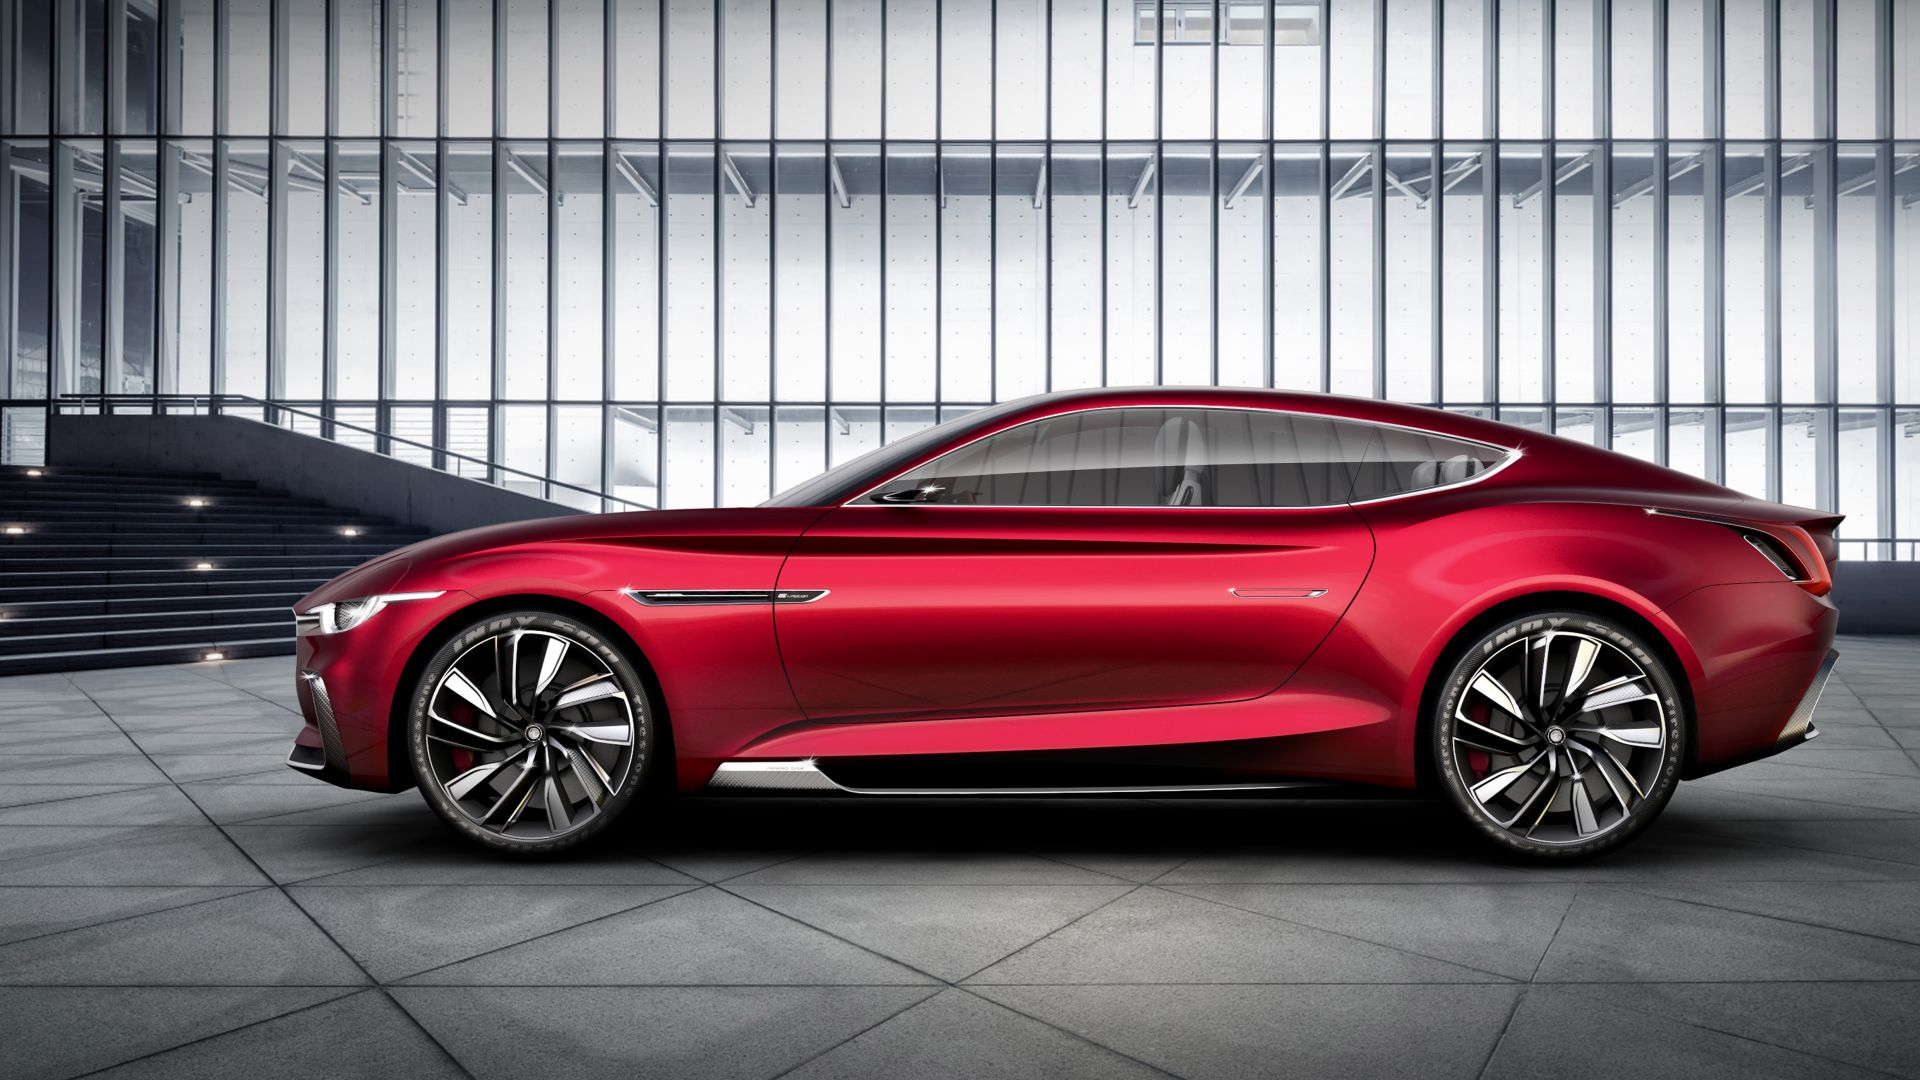 Wallpaper MG E-Motion, Electric Cars, 2020 Cars, 6k, Cars